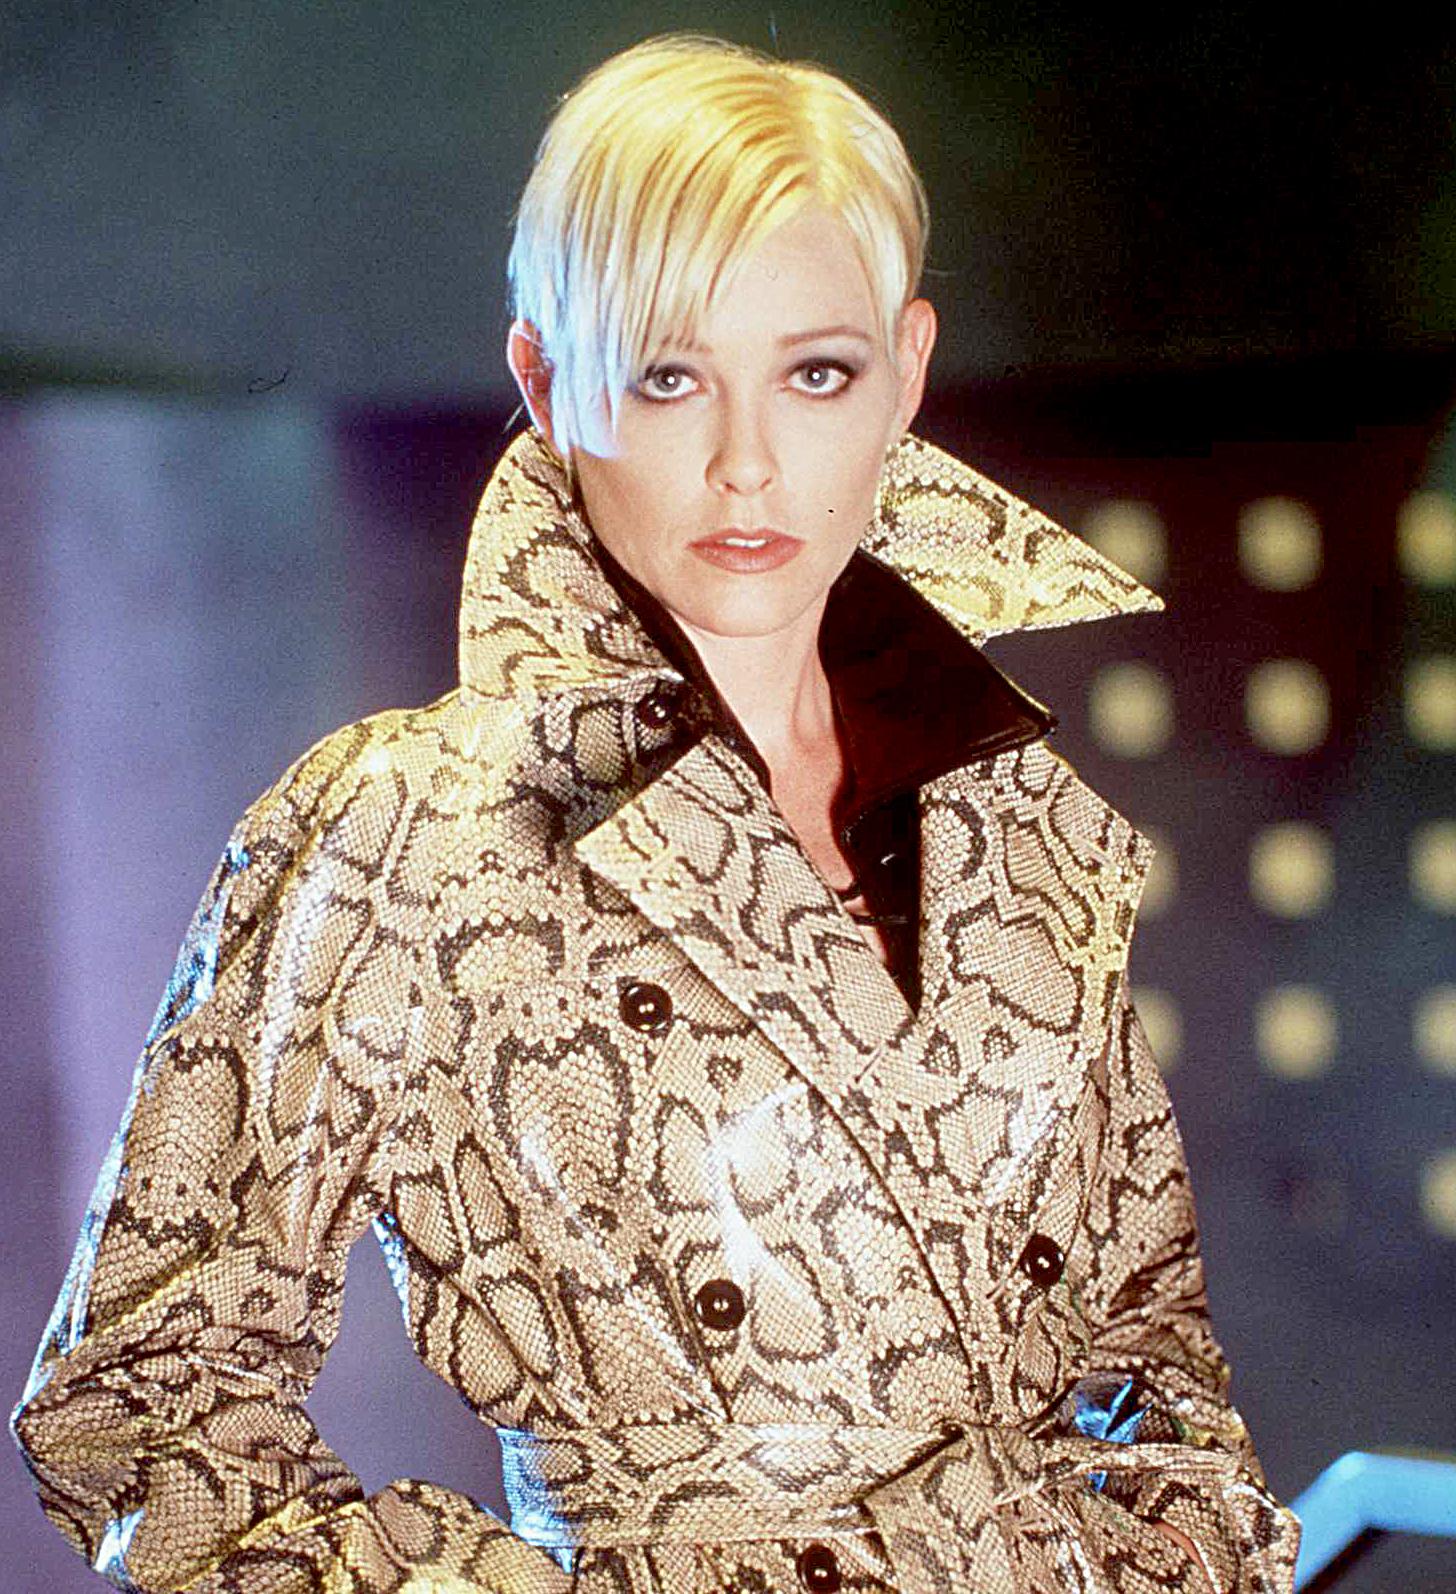 Young Pamela Catherine looks total clad in the designer coat